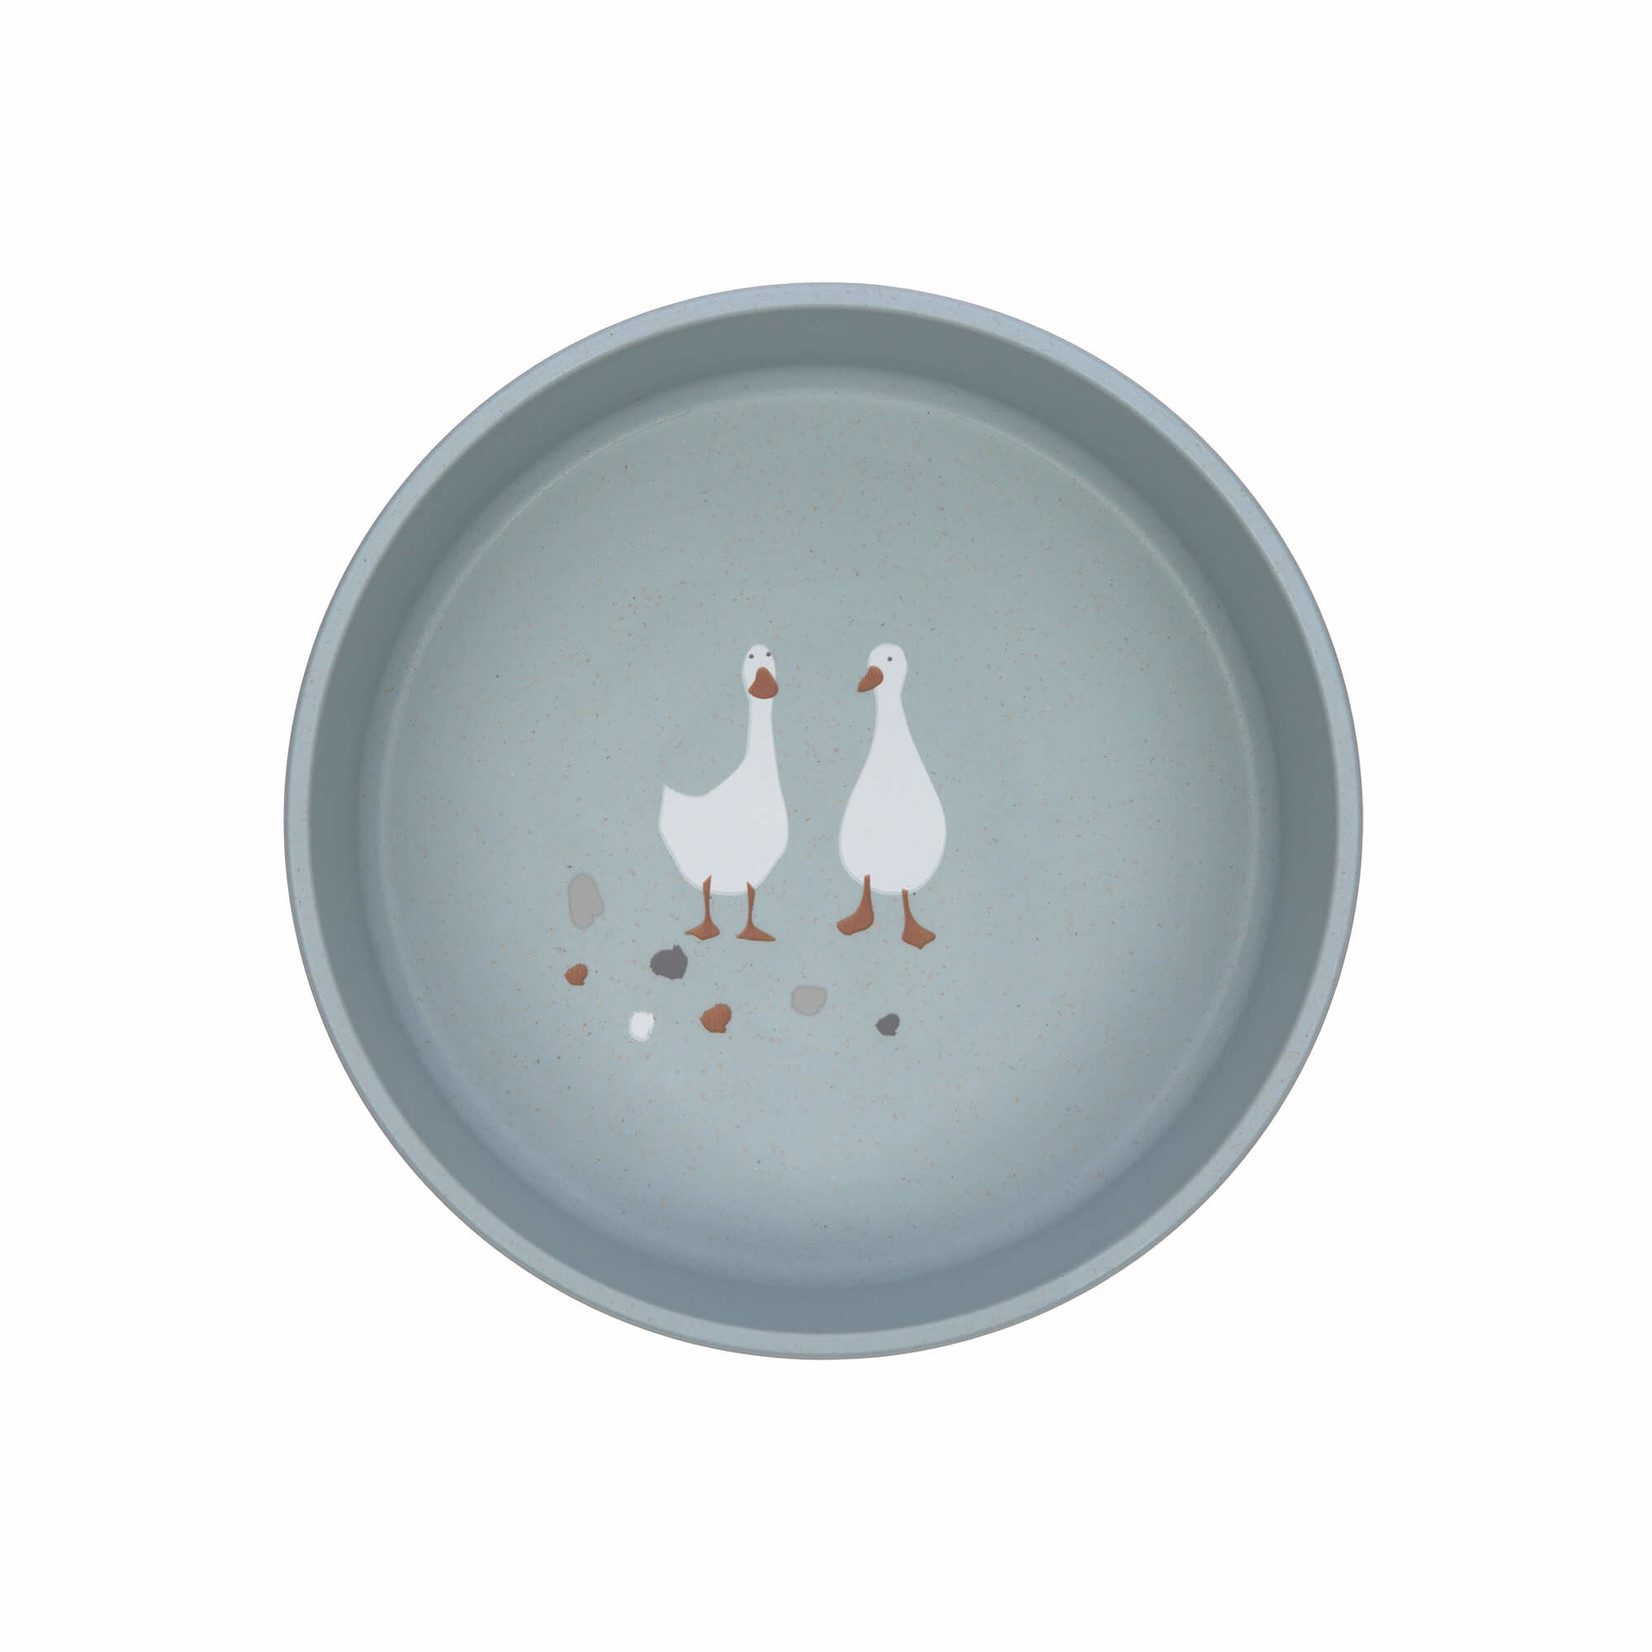 Lässig Bowl PP/Cellulose Tiny Farmer Sheep/Goose Blue